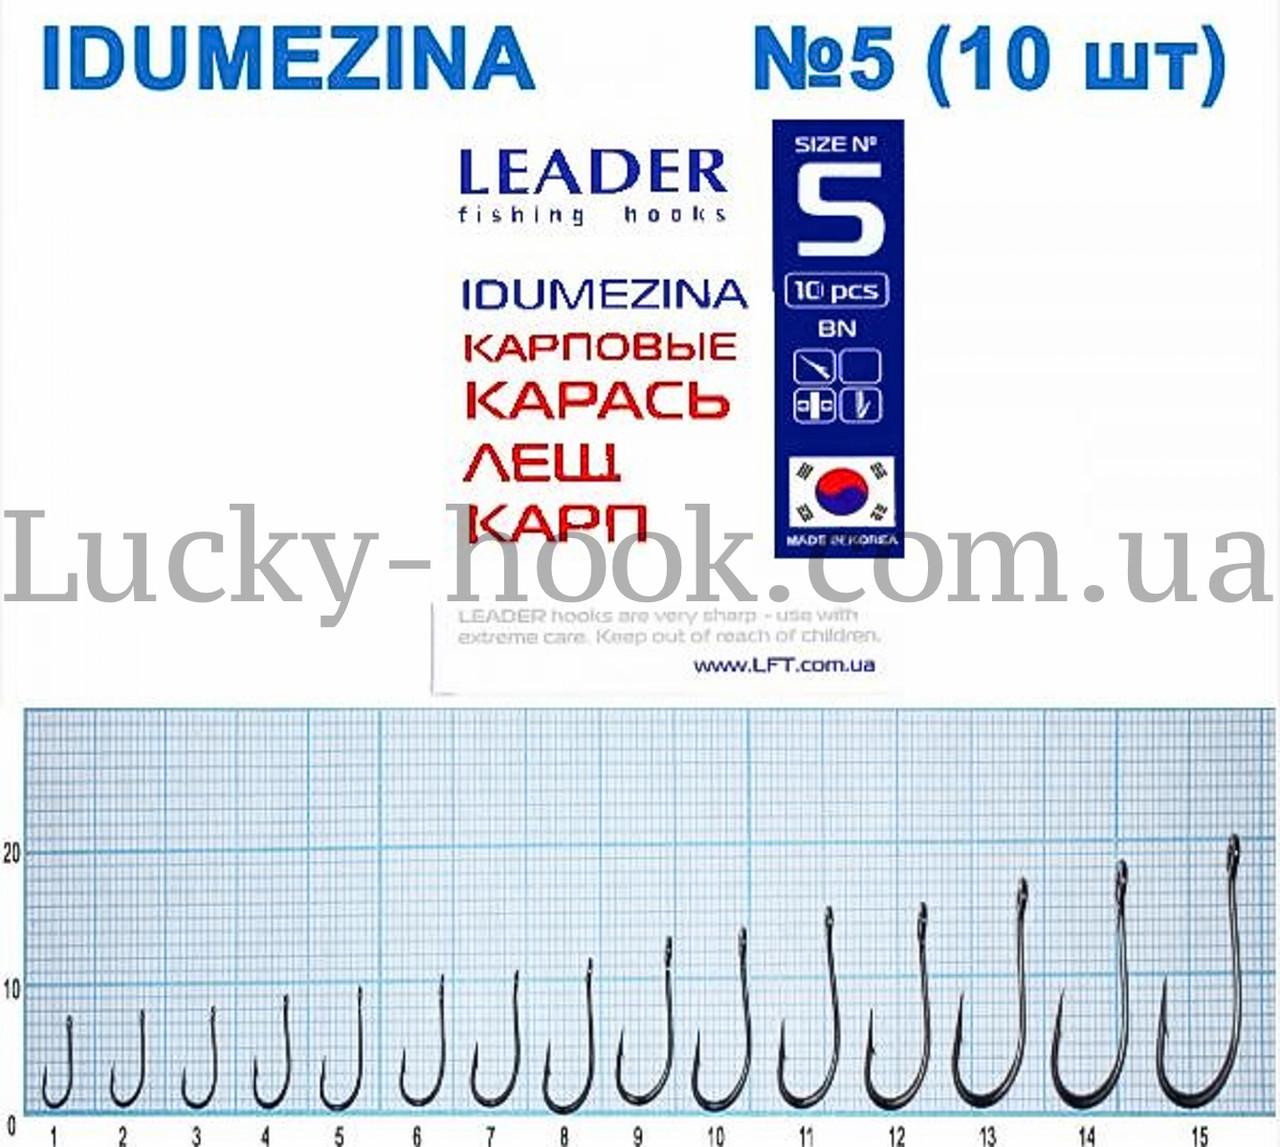 Крючок Leader Idumezina (карась, лещ, карп) № 5